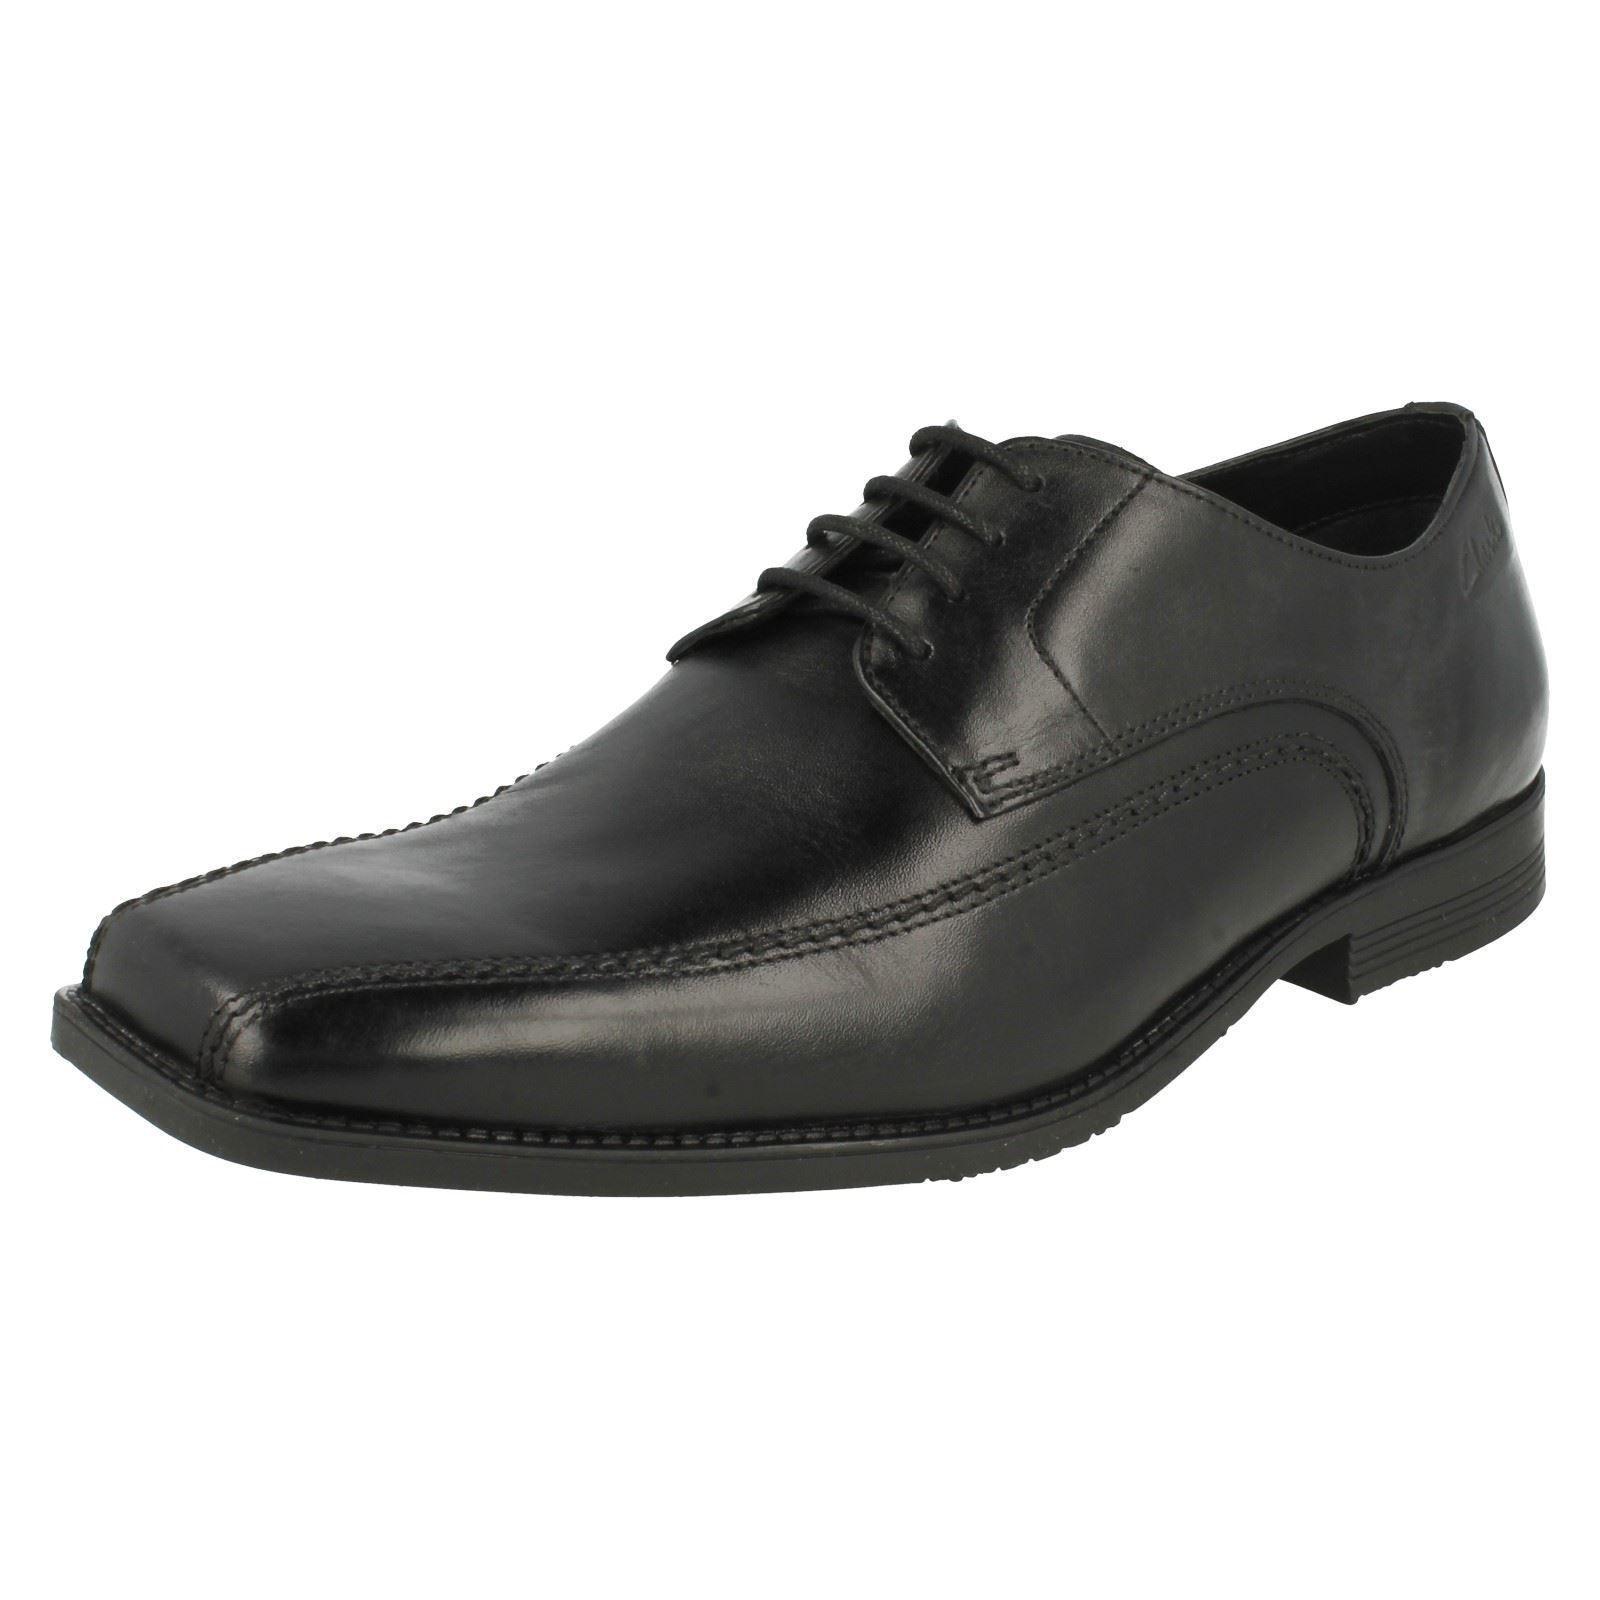 Herren Clarks G PASSFORM zum Schnüren Schuhe - Baker Spitze